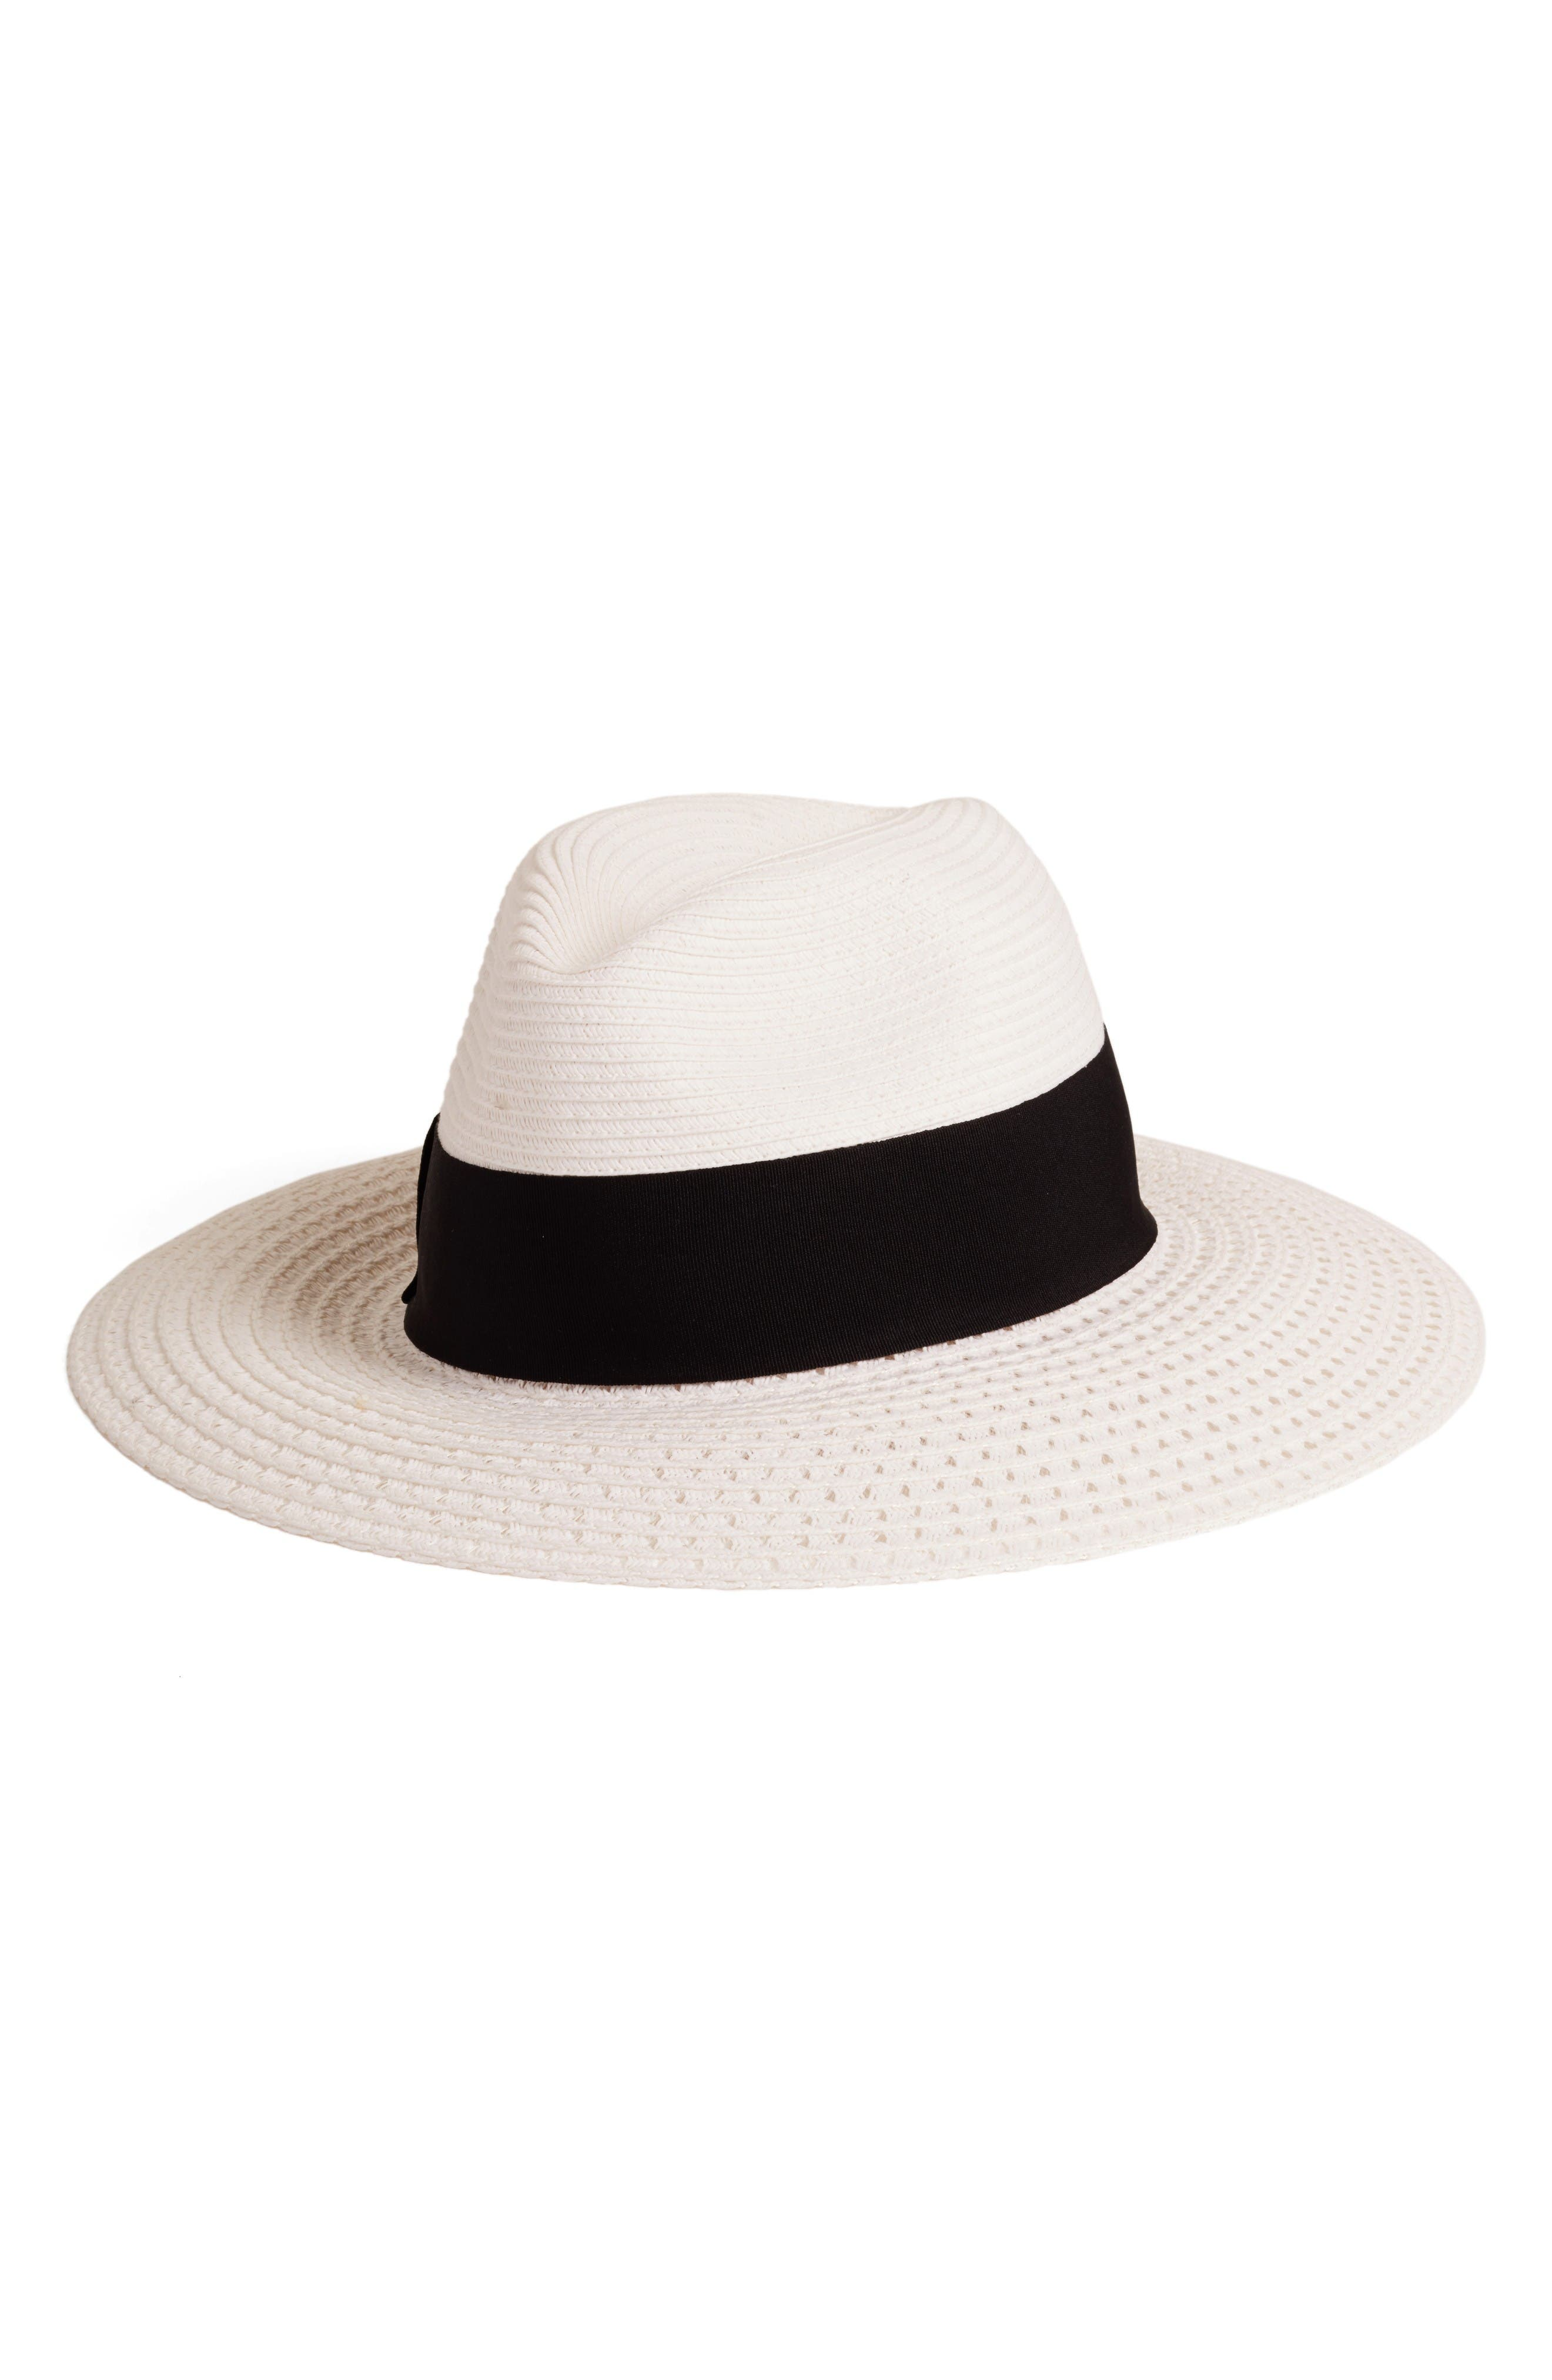 Alternate Image 1 Selected - Nordstrom Wide Brim Straw Panama Hat